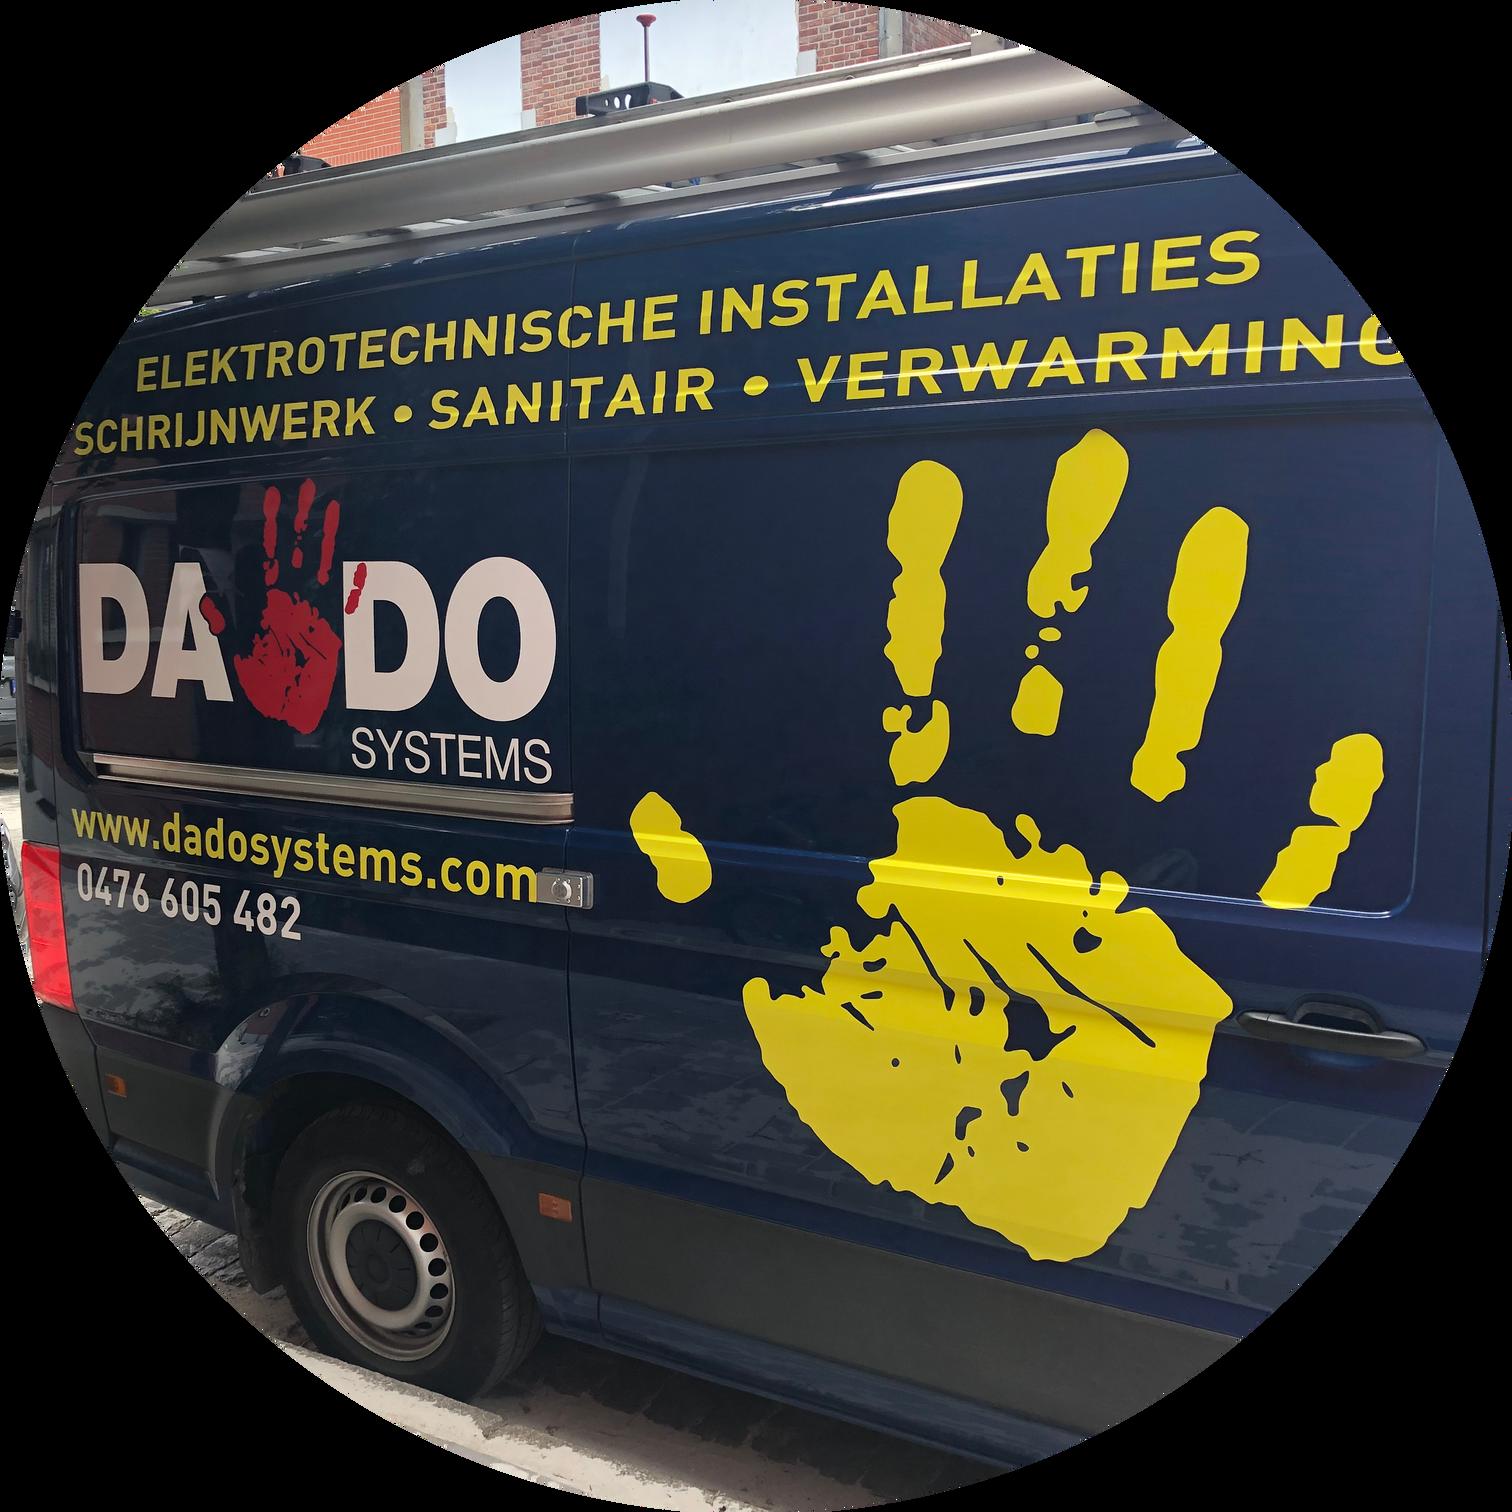 Dado Systems logo